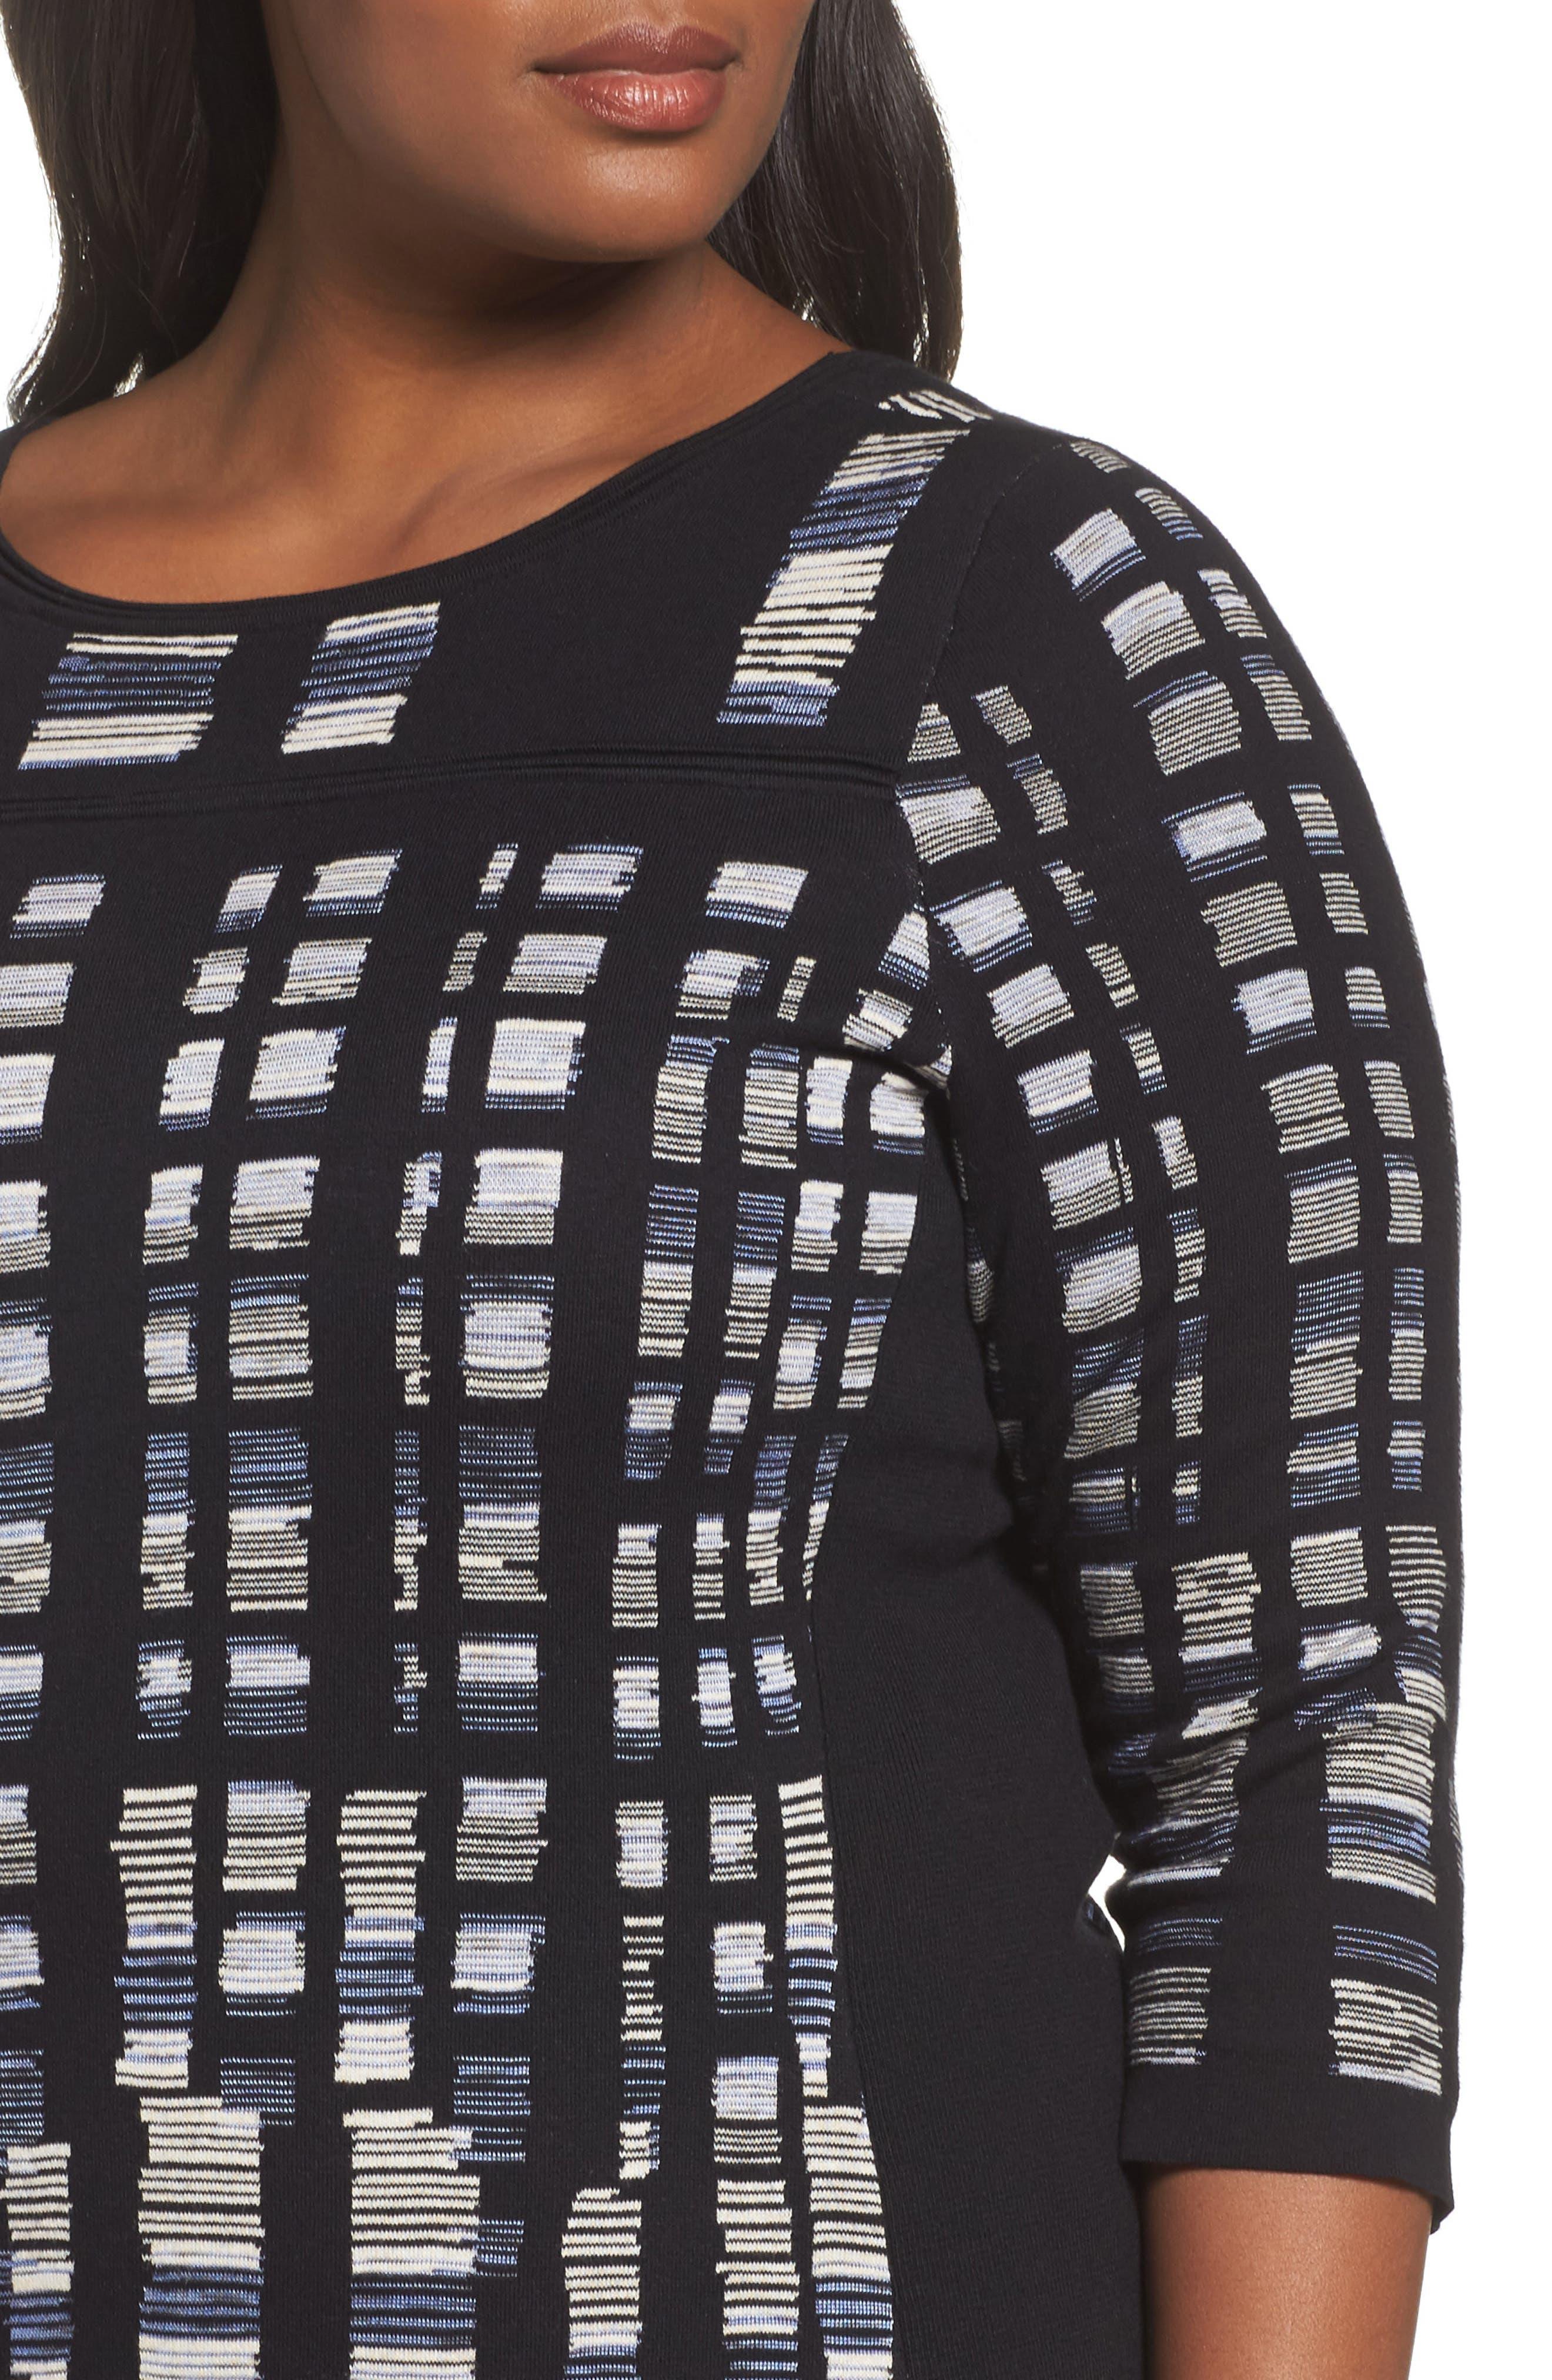 Crystal Cove Sweater,                             Alternate thumbnail 4, color,                             Black Multi